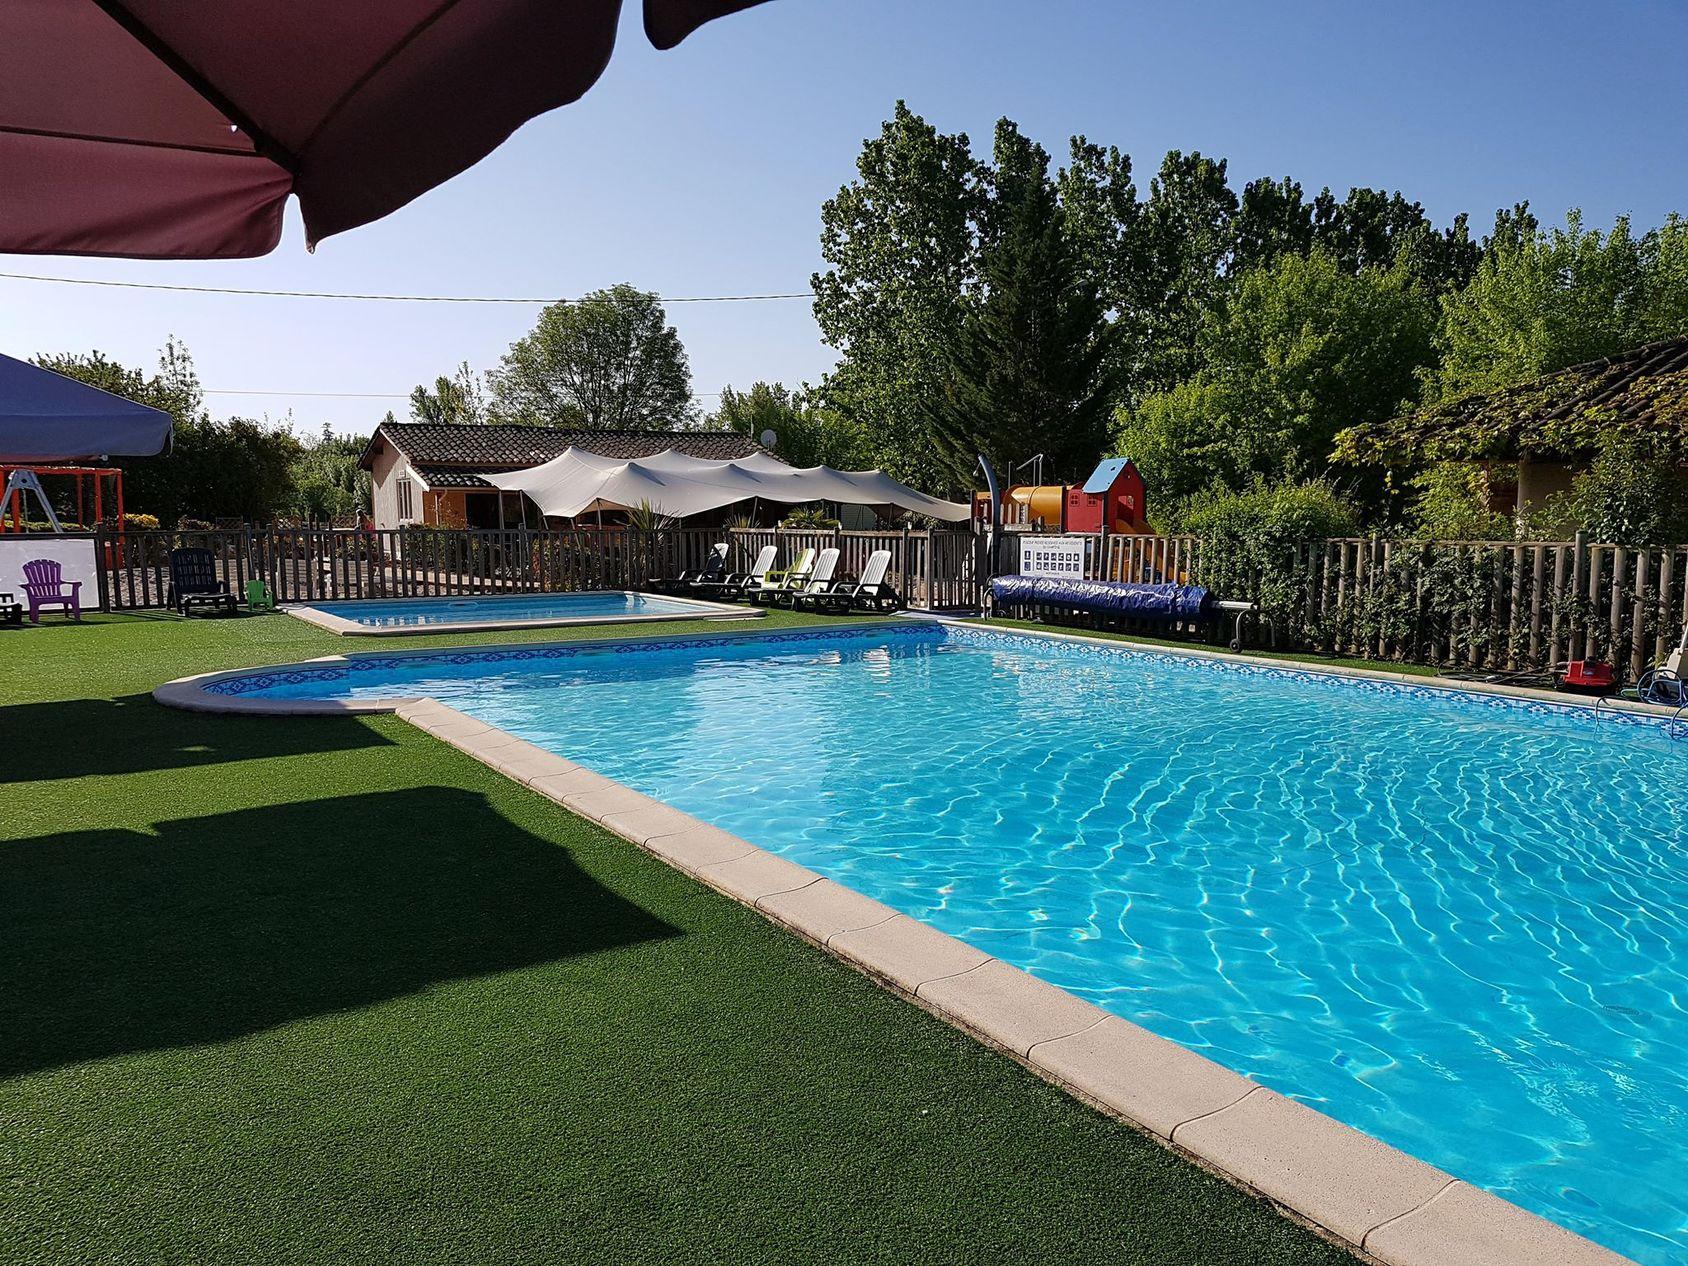 Frankrijk-Montricoux-Camping%20Le%20Clos%20Lalande-ExtraLarge Wintersport Frankrijk|Pagina 2 van 55